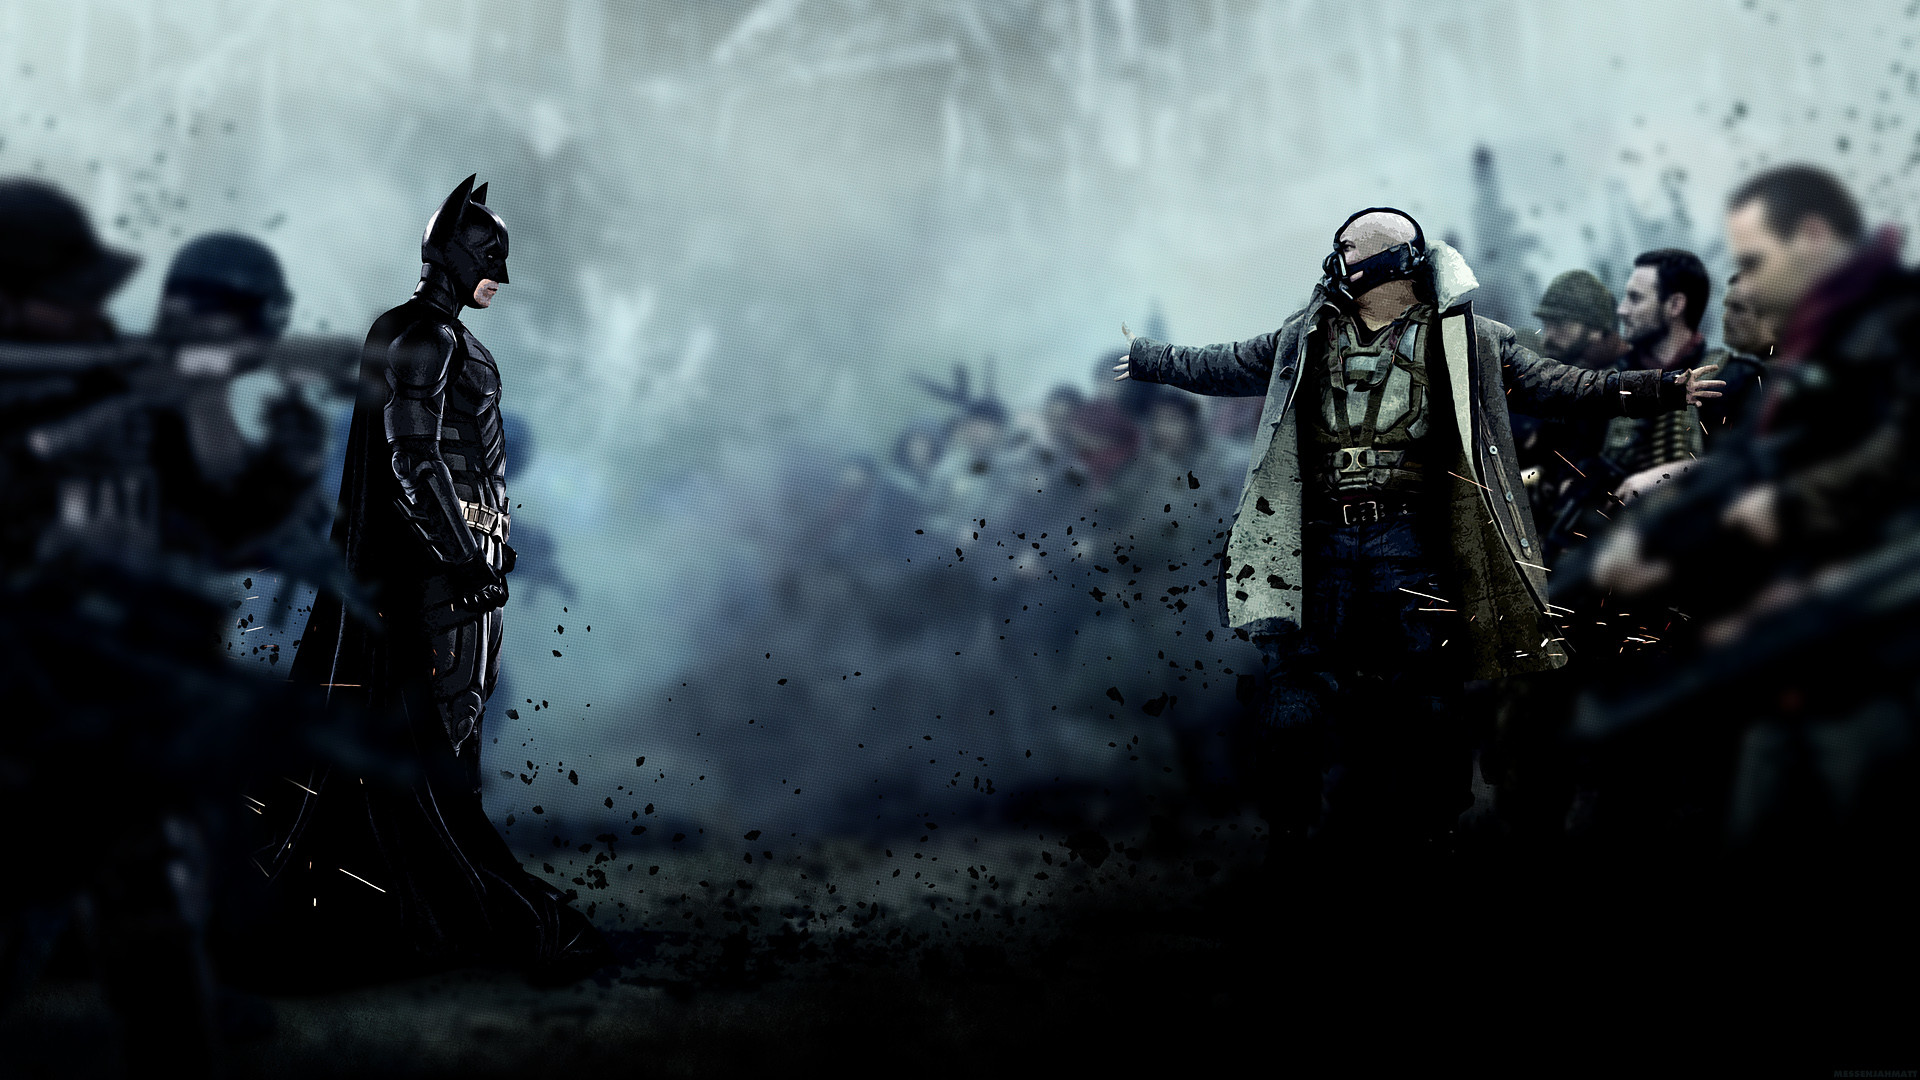 Batman vs Bane – The Dark Knight Rises